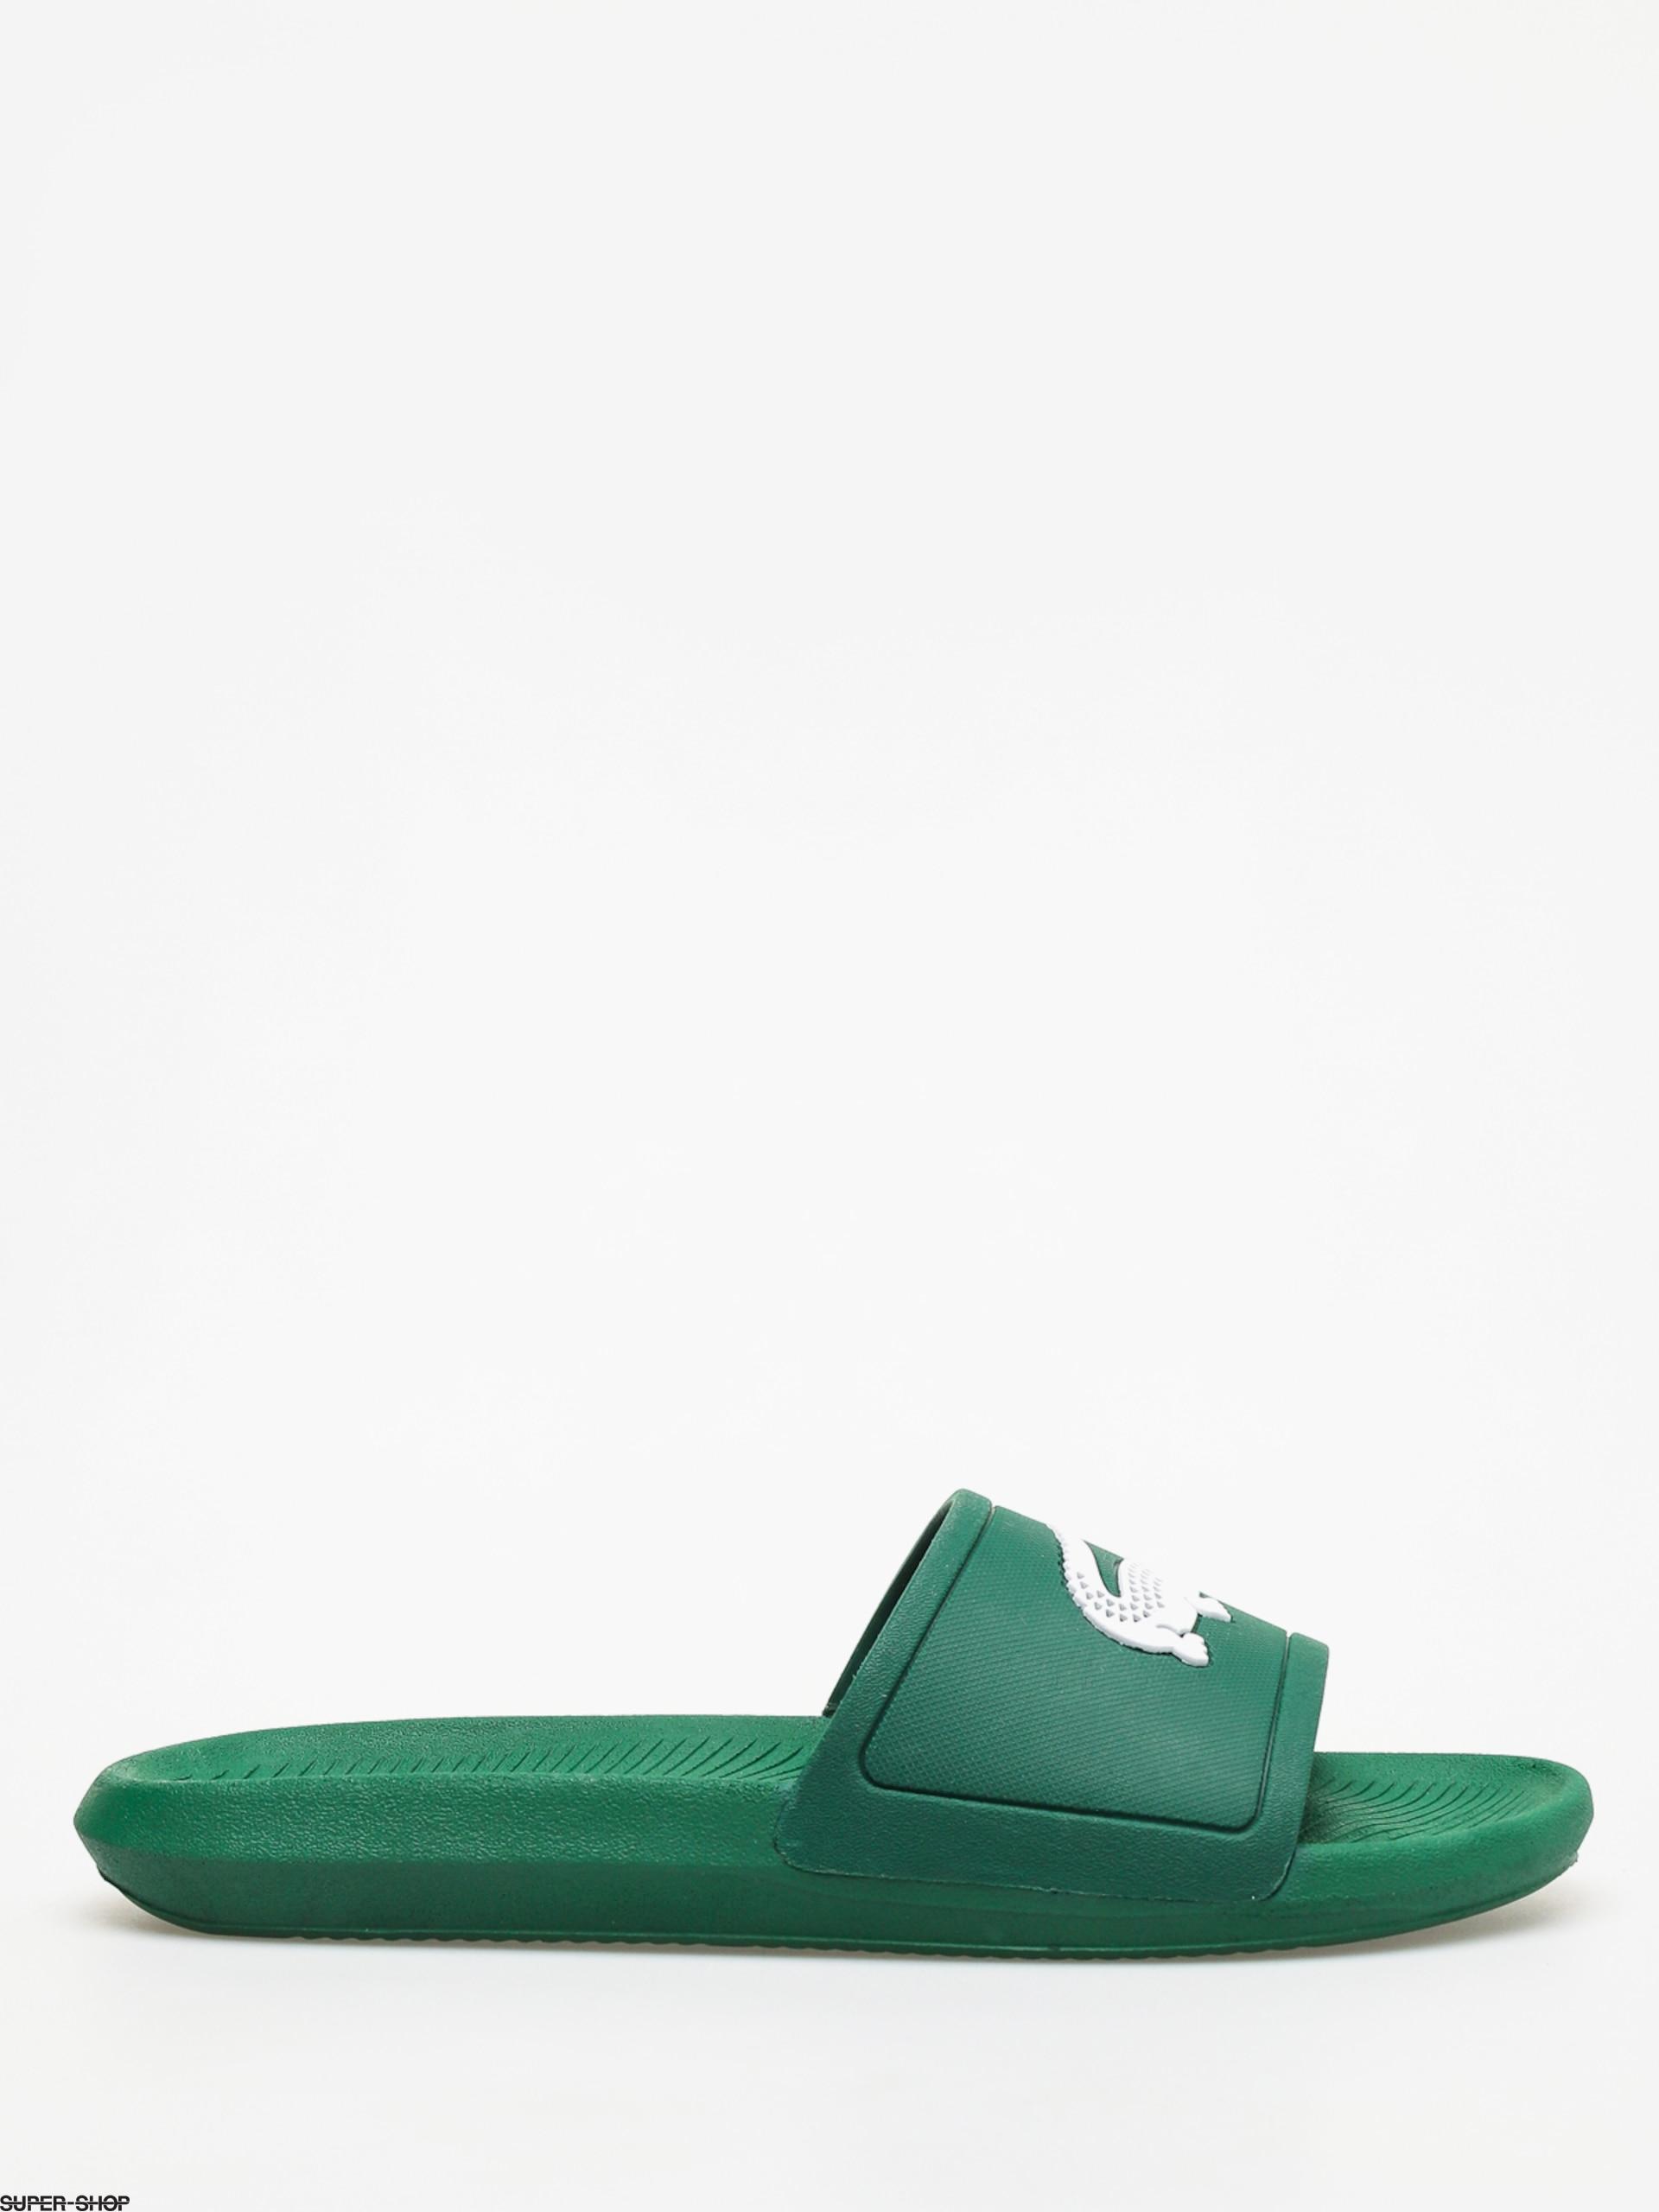 Lacoste Croco Slide 119 1 Flip-flops